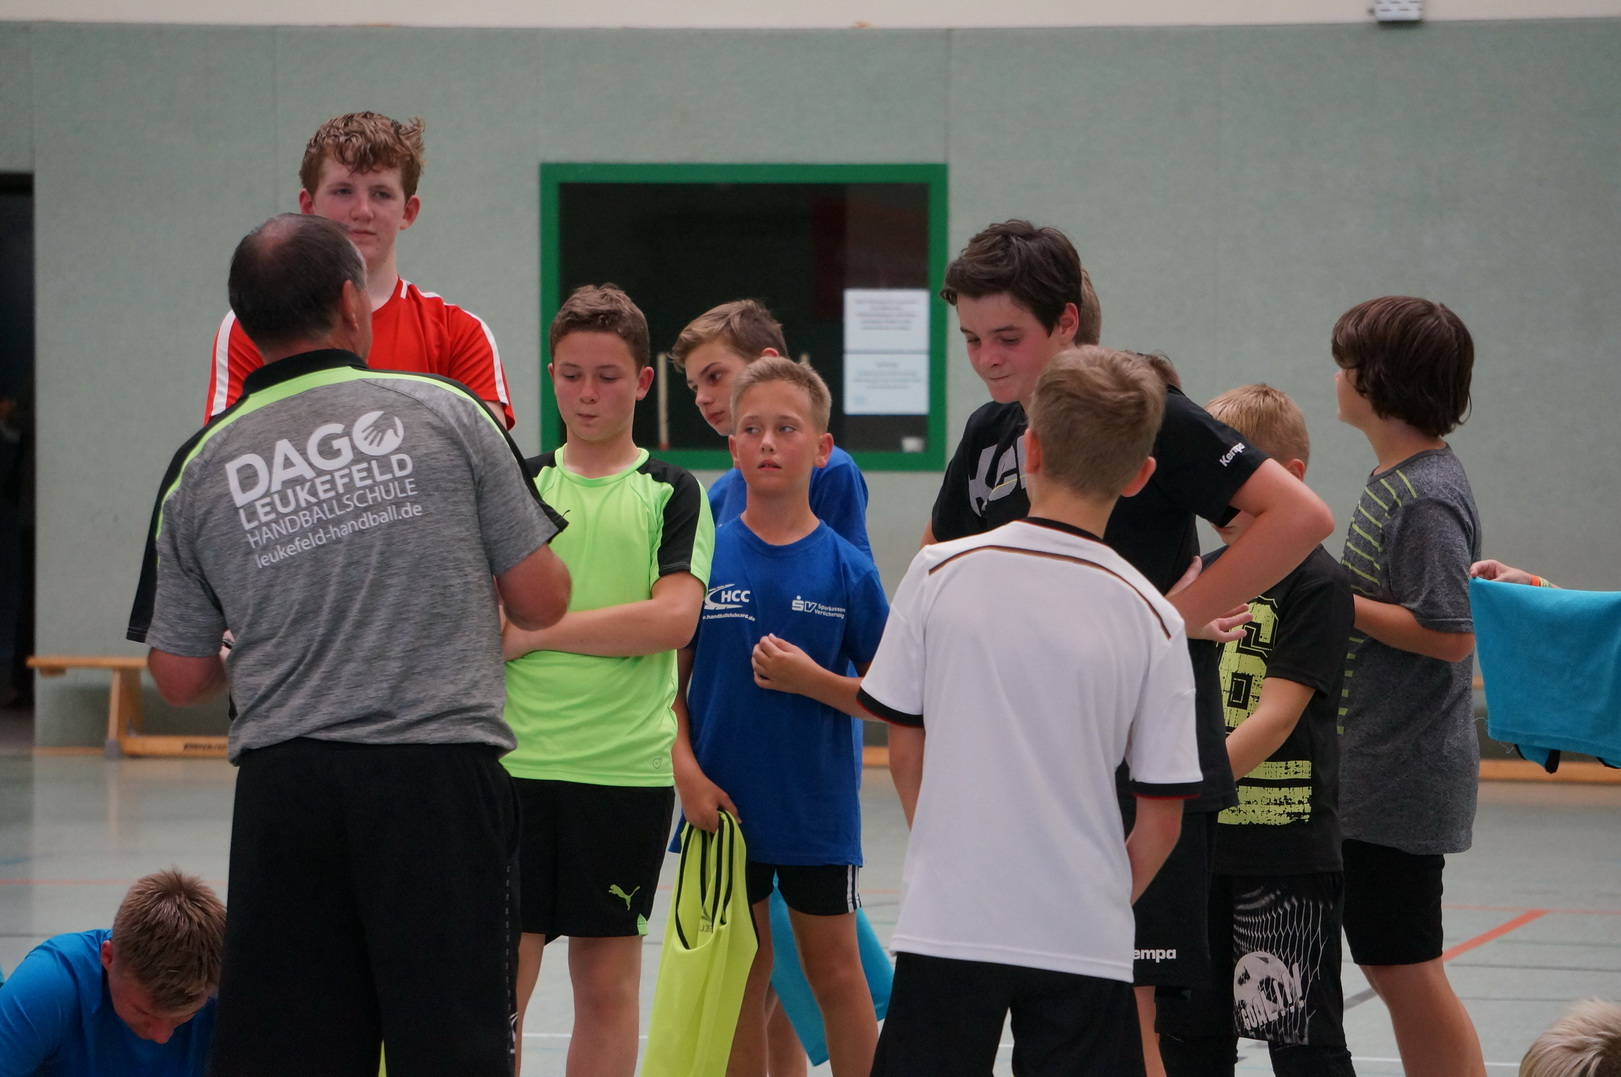 201808_Handballcamp_SDH_MG_133w